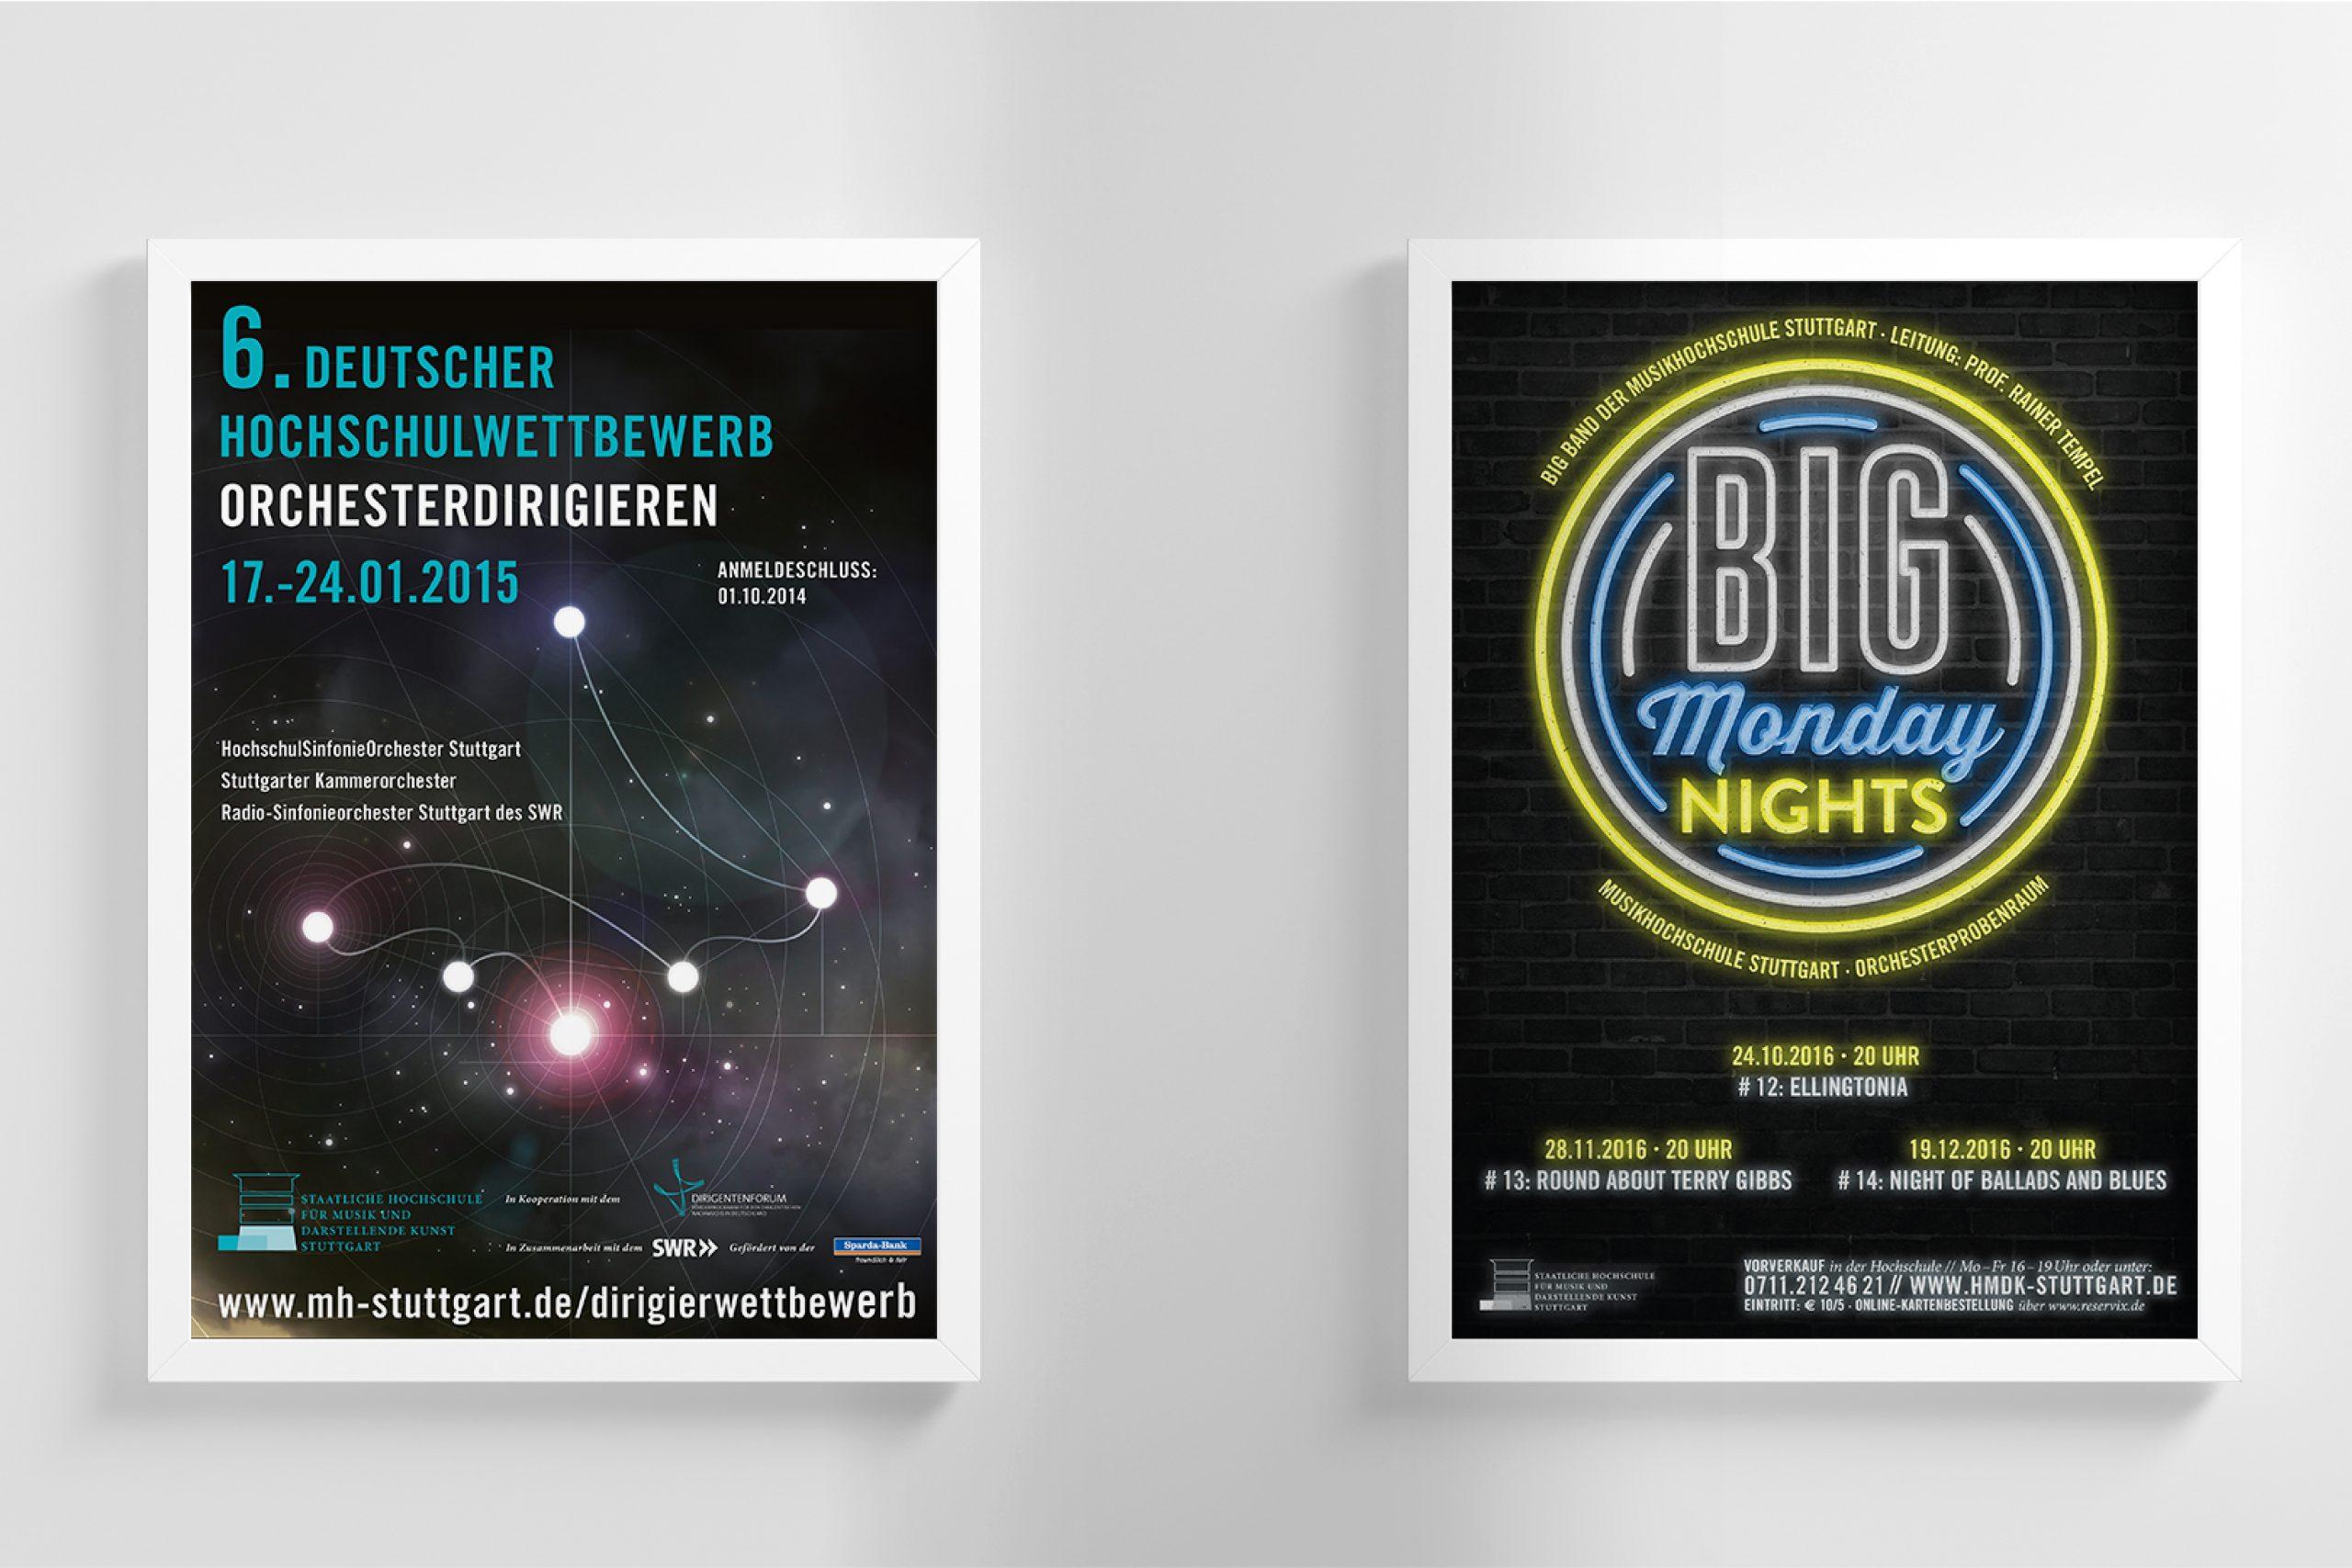 Hochschule_Musik_Dirigent_Big_Monday_Nights_by_majormajor